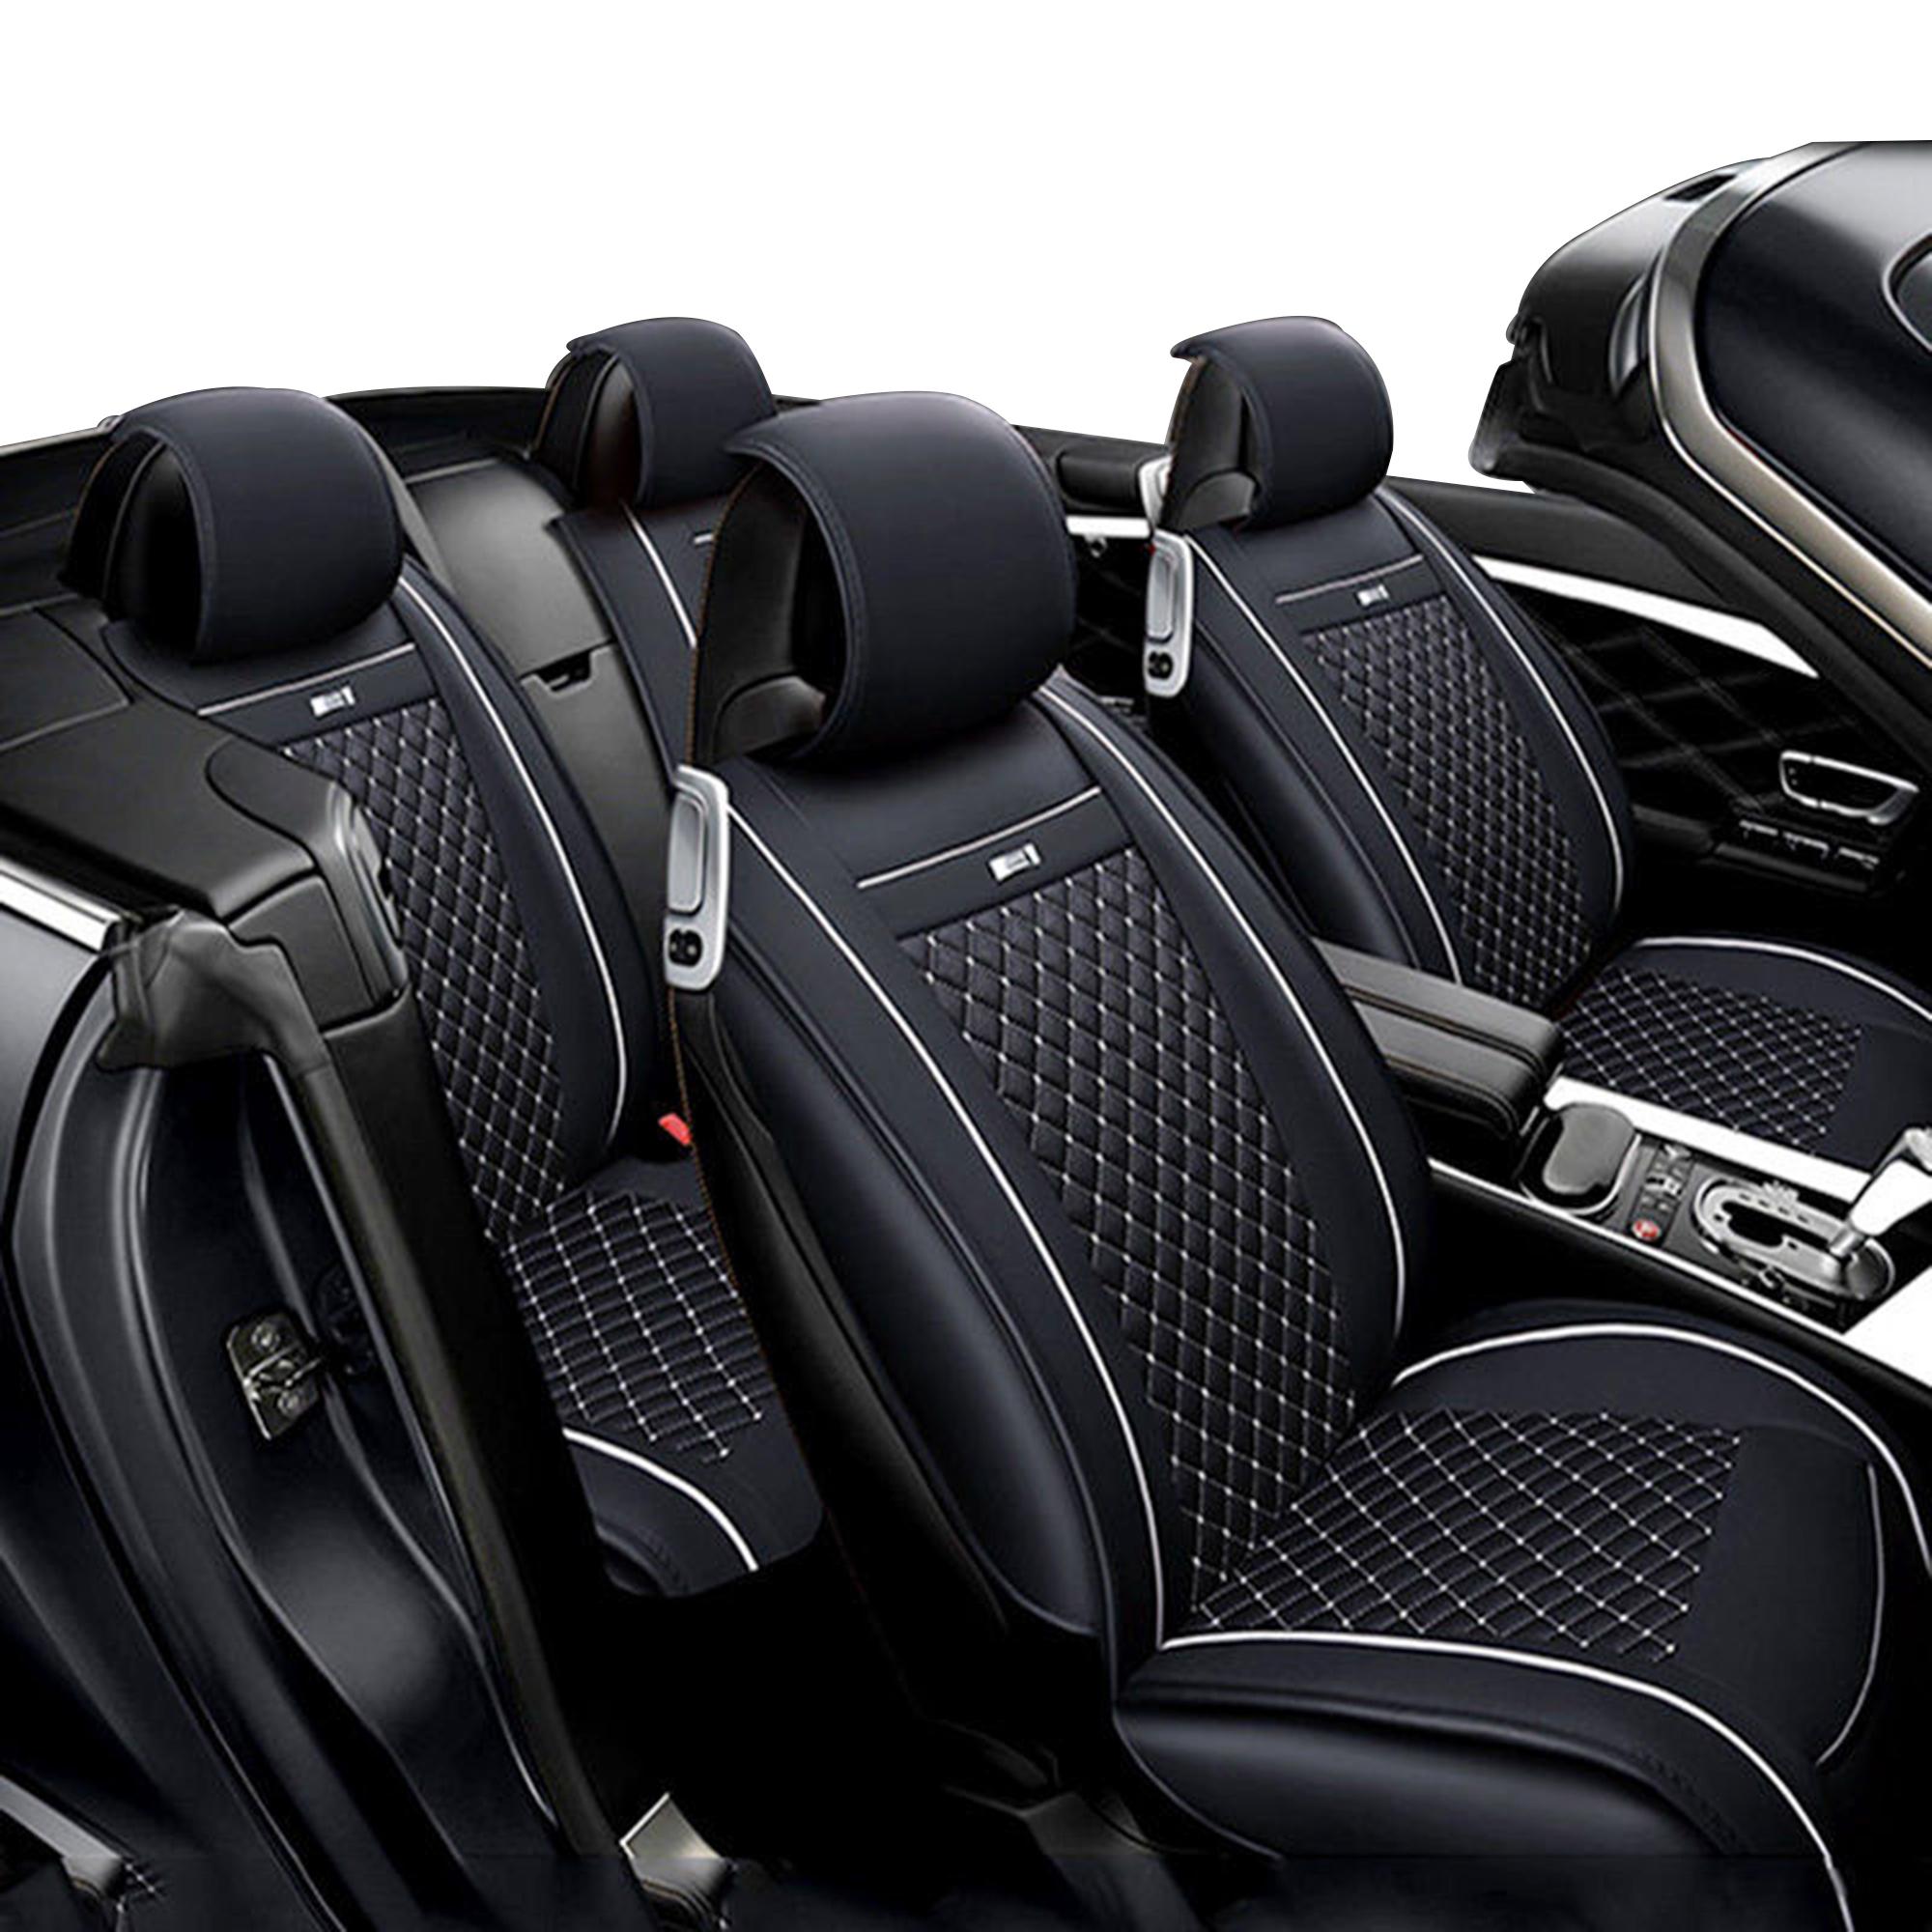 Tinton Life Pu Leather Full Set Universal Car Seat